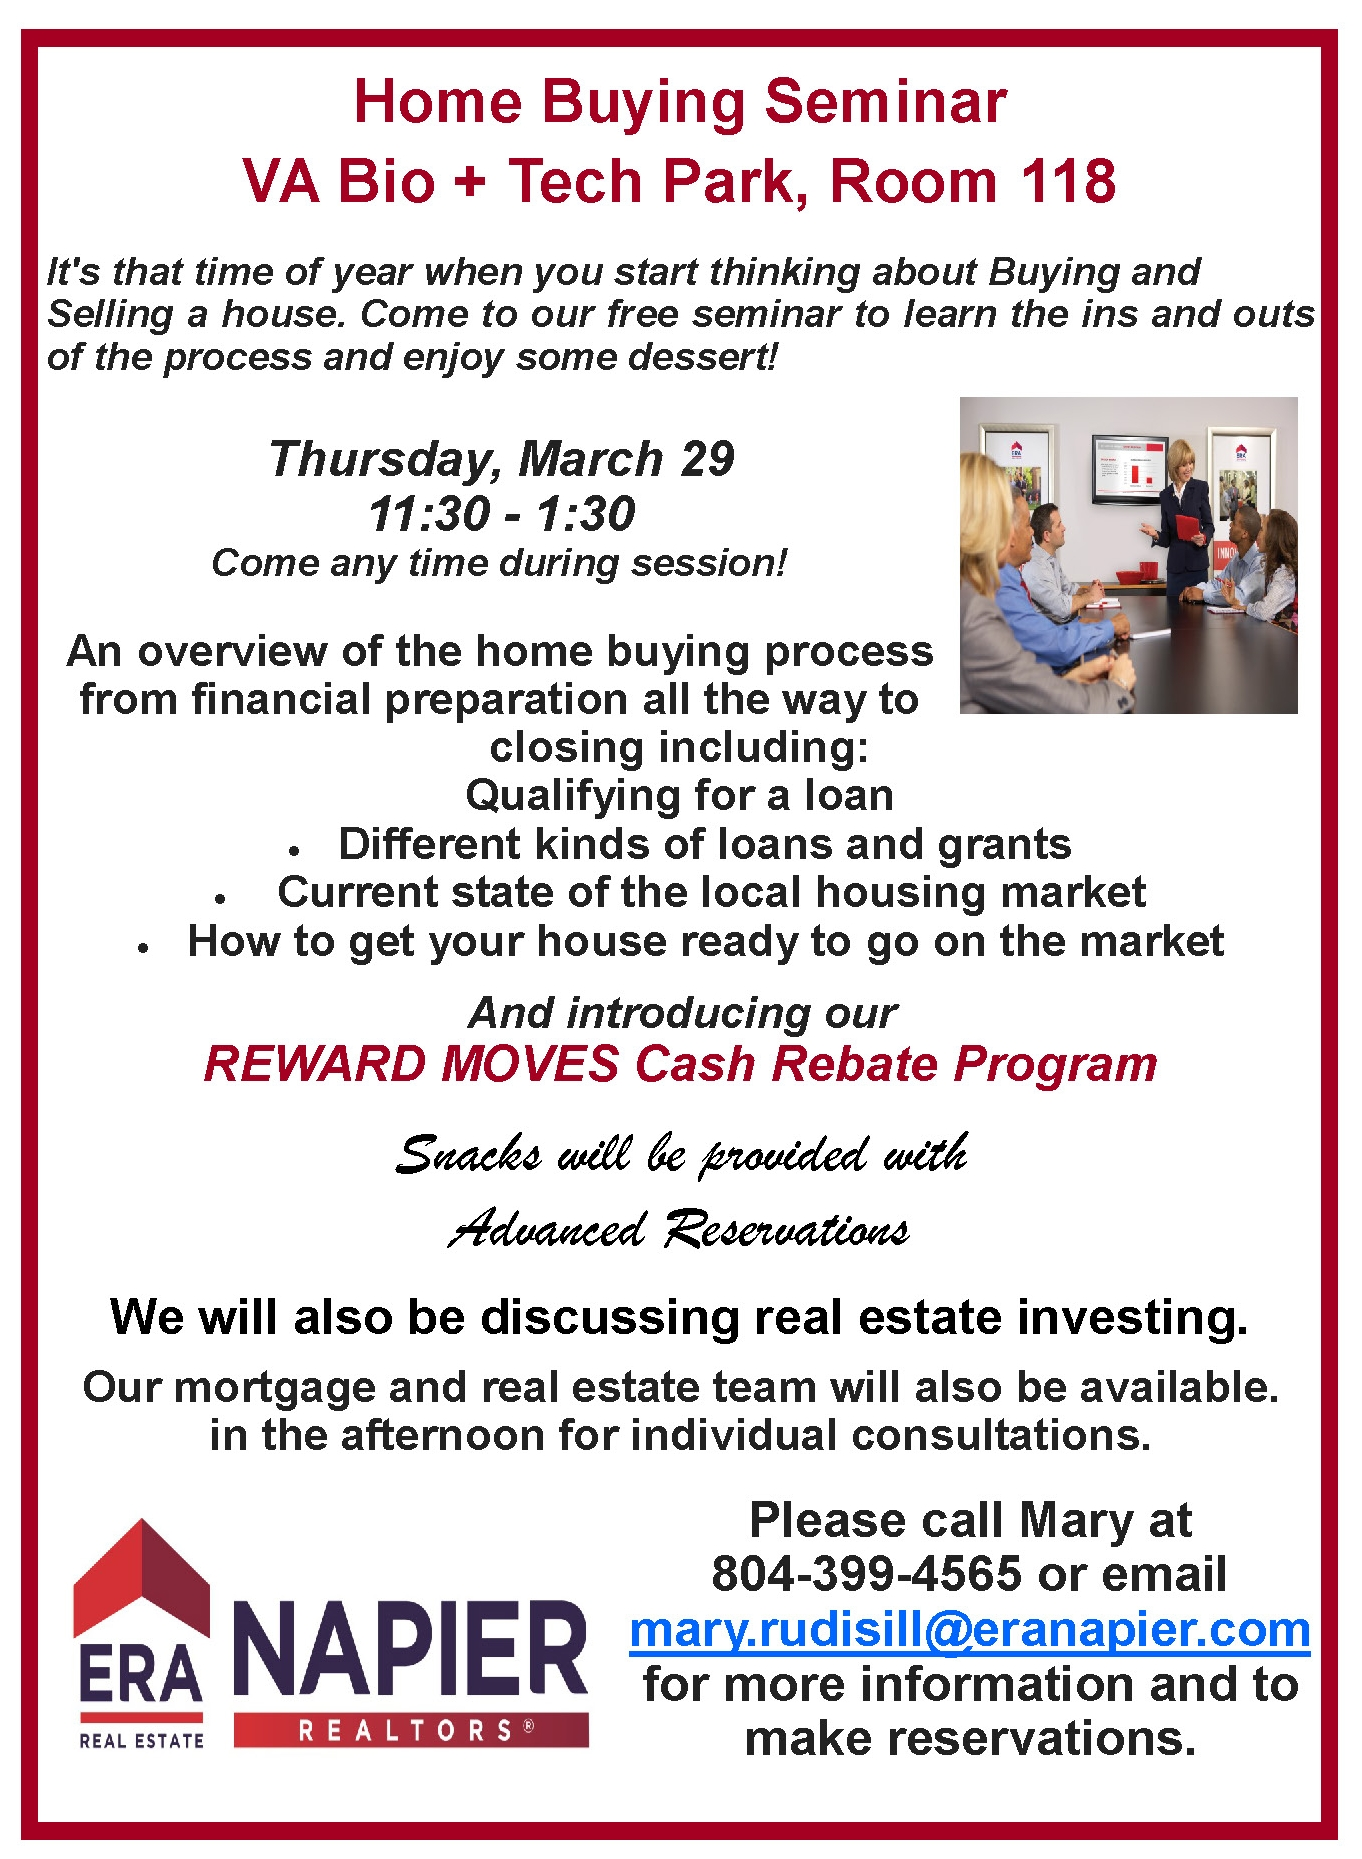 Home Buying Seminar 3-29.jpg